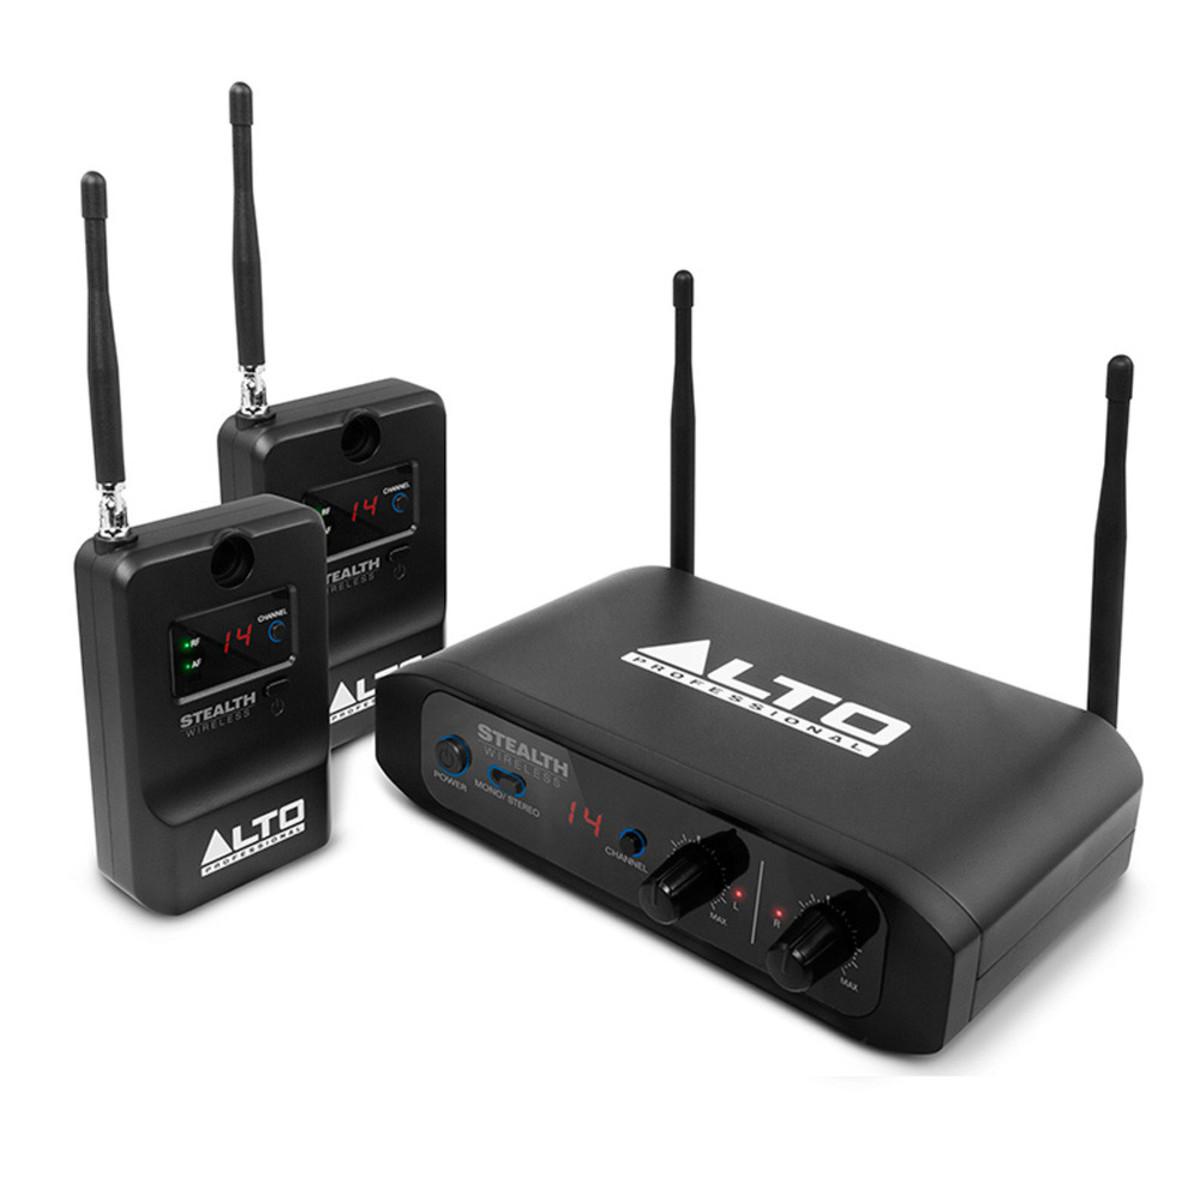 Alto Stealth Wireless 2 Channel Wireless Speaker System At